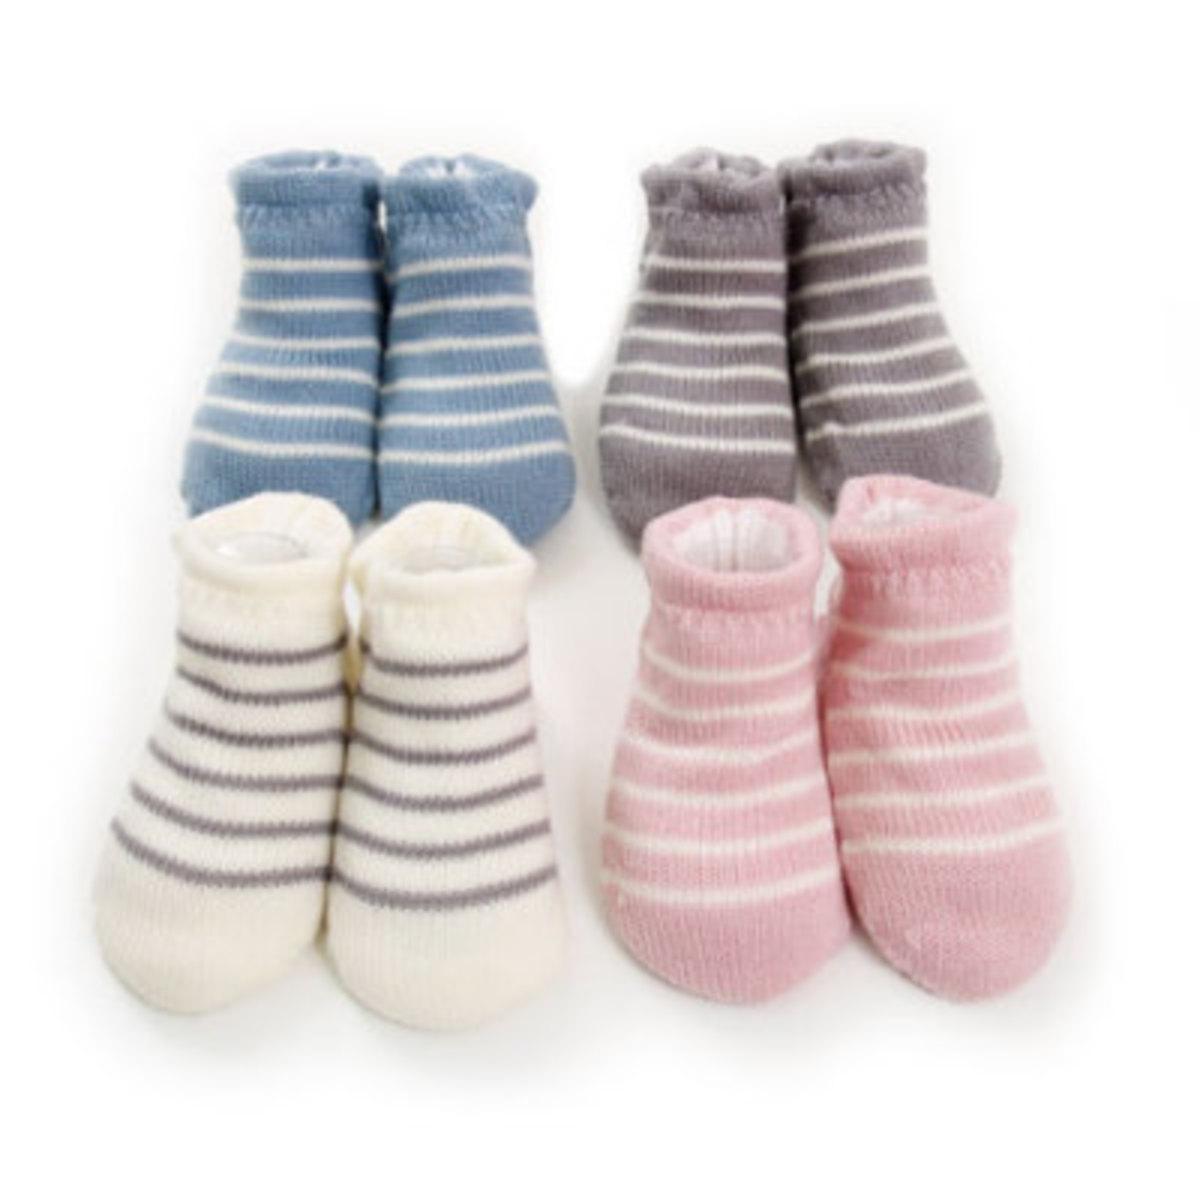 Organic Wool KB2 Baby Socks - Natural